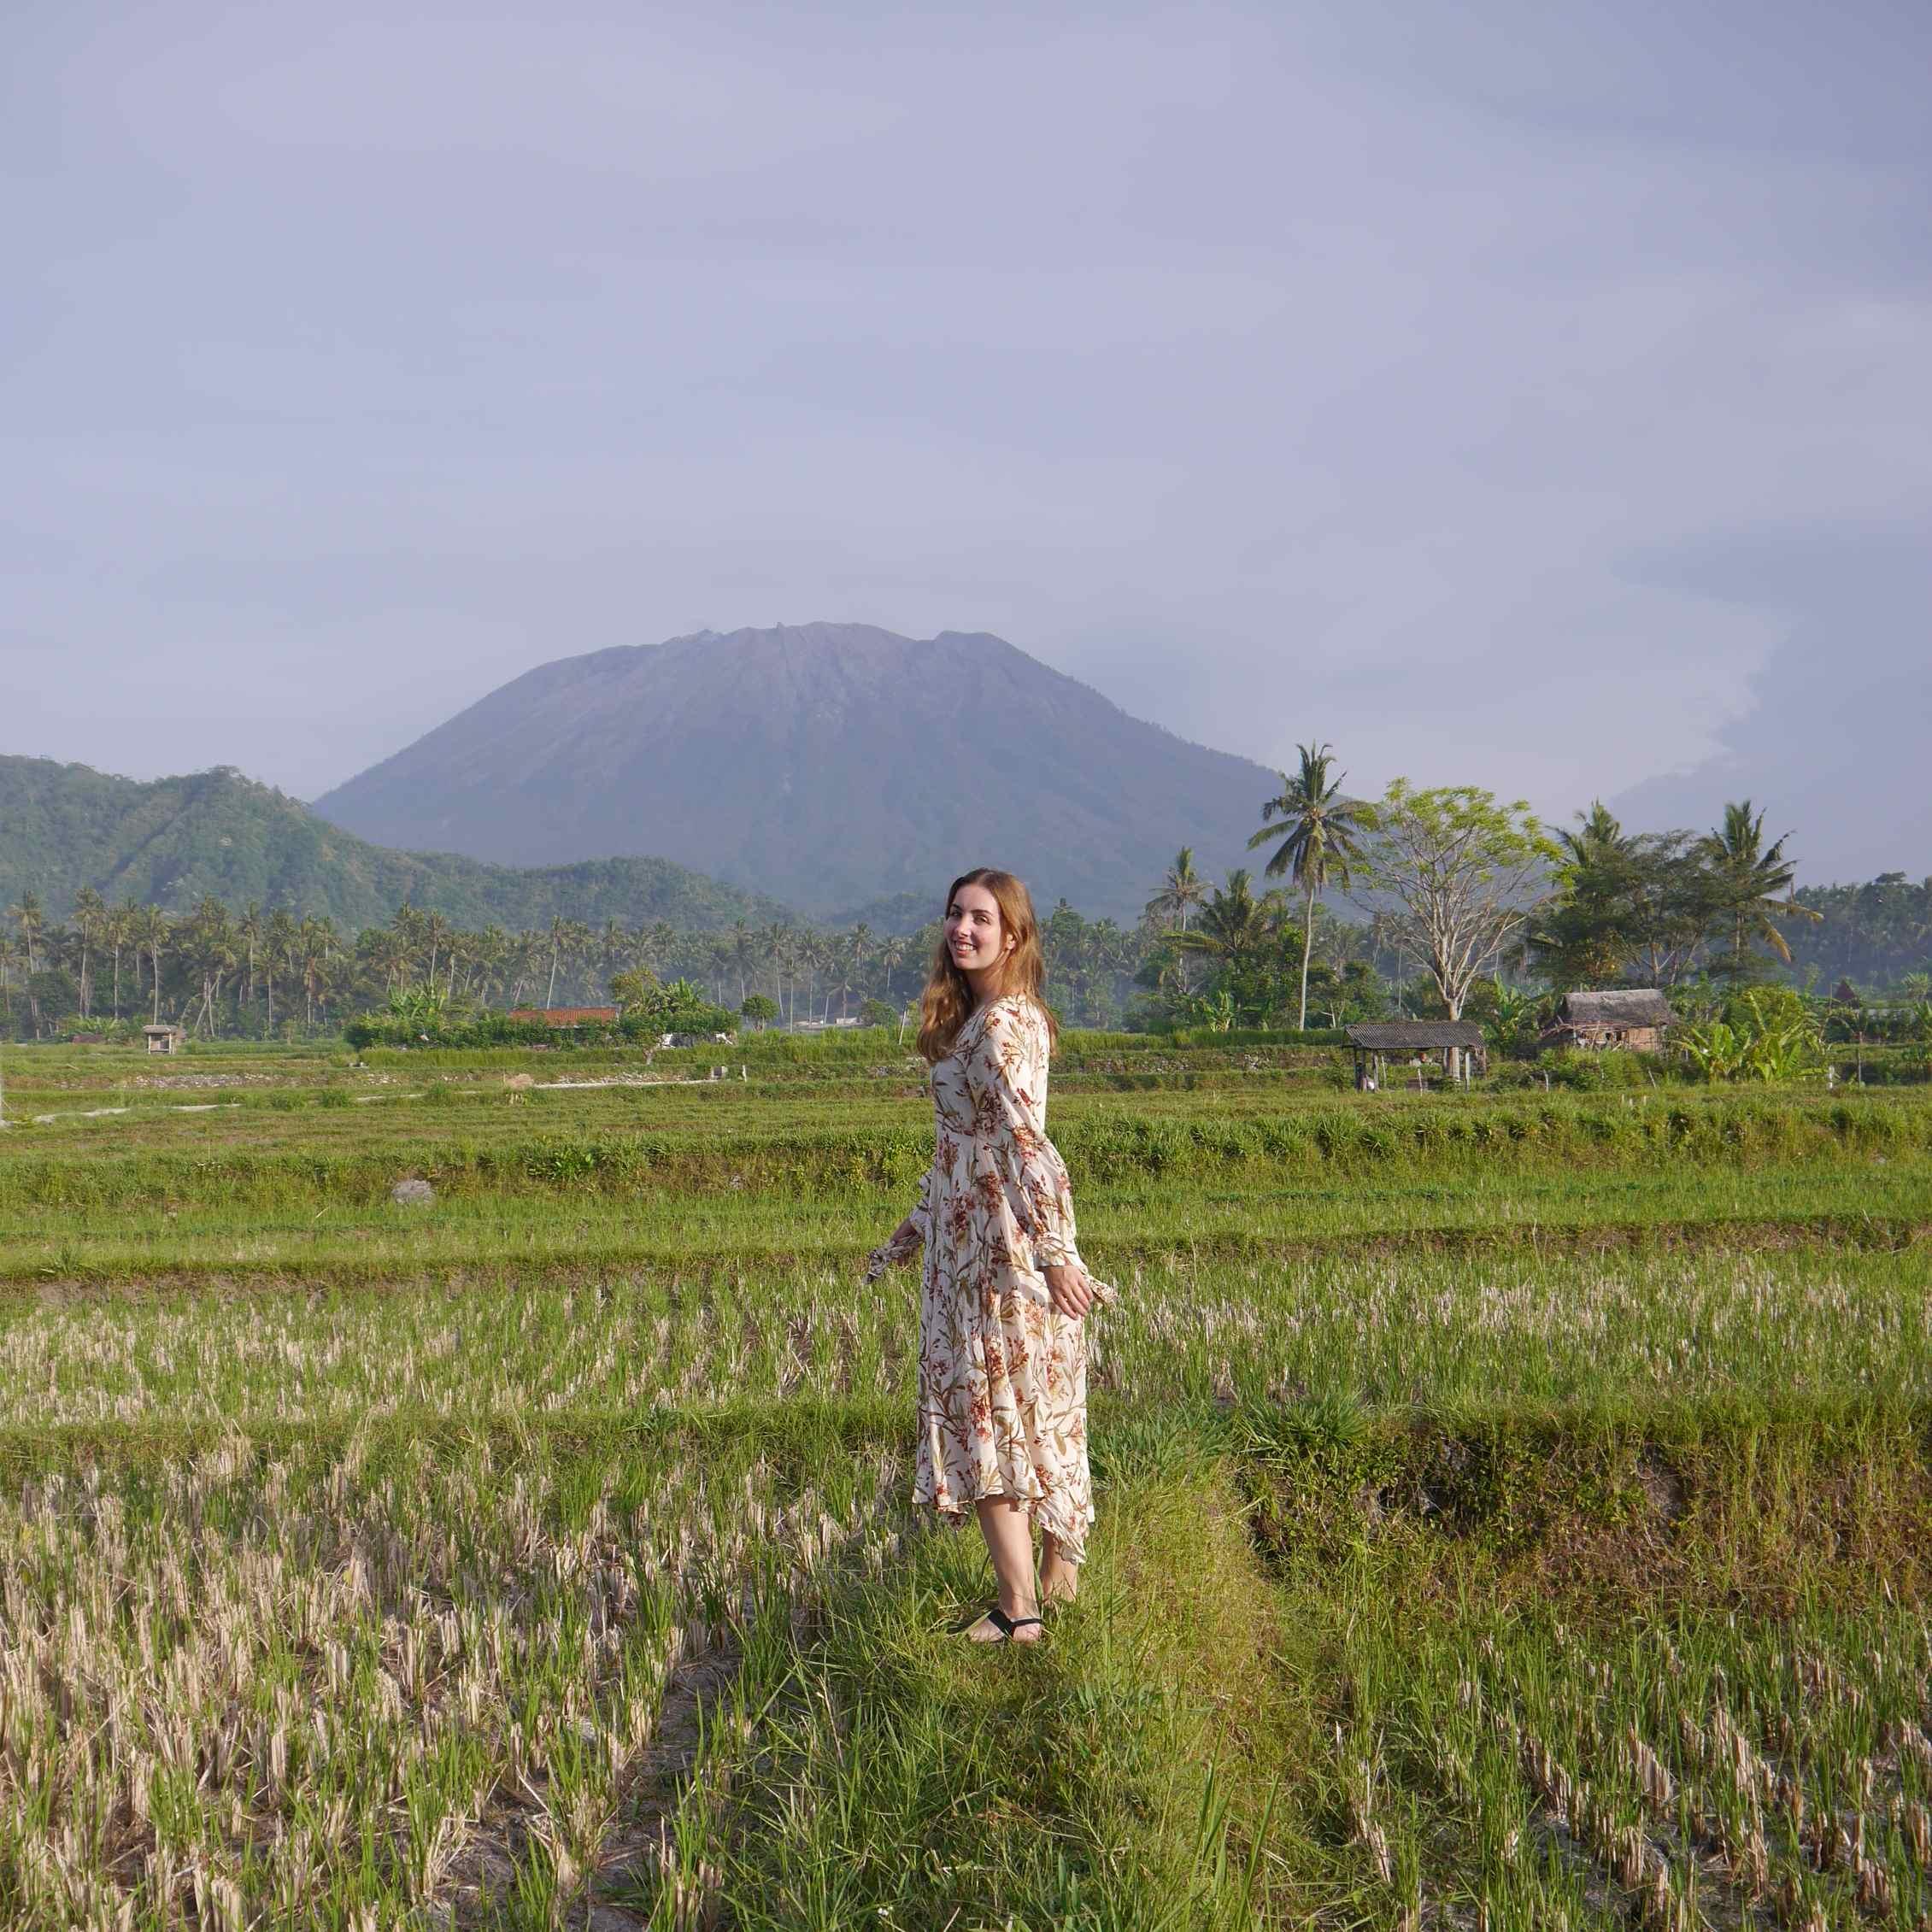 Der Agung Vulkan ist der größte Vulkan auf Bali.